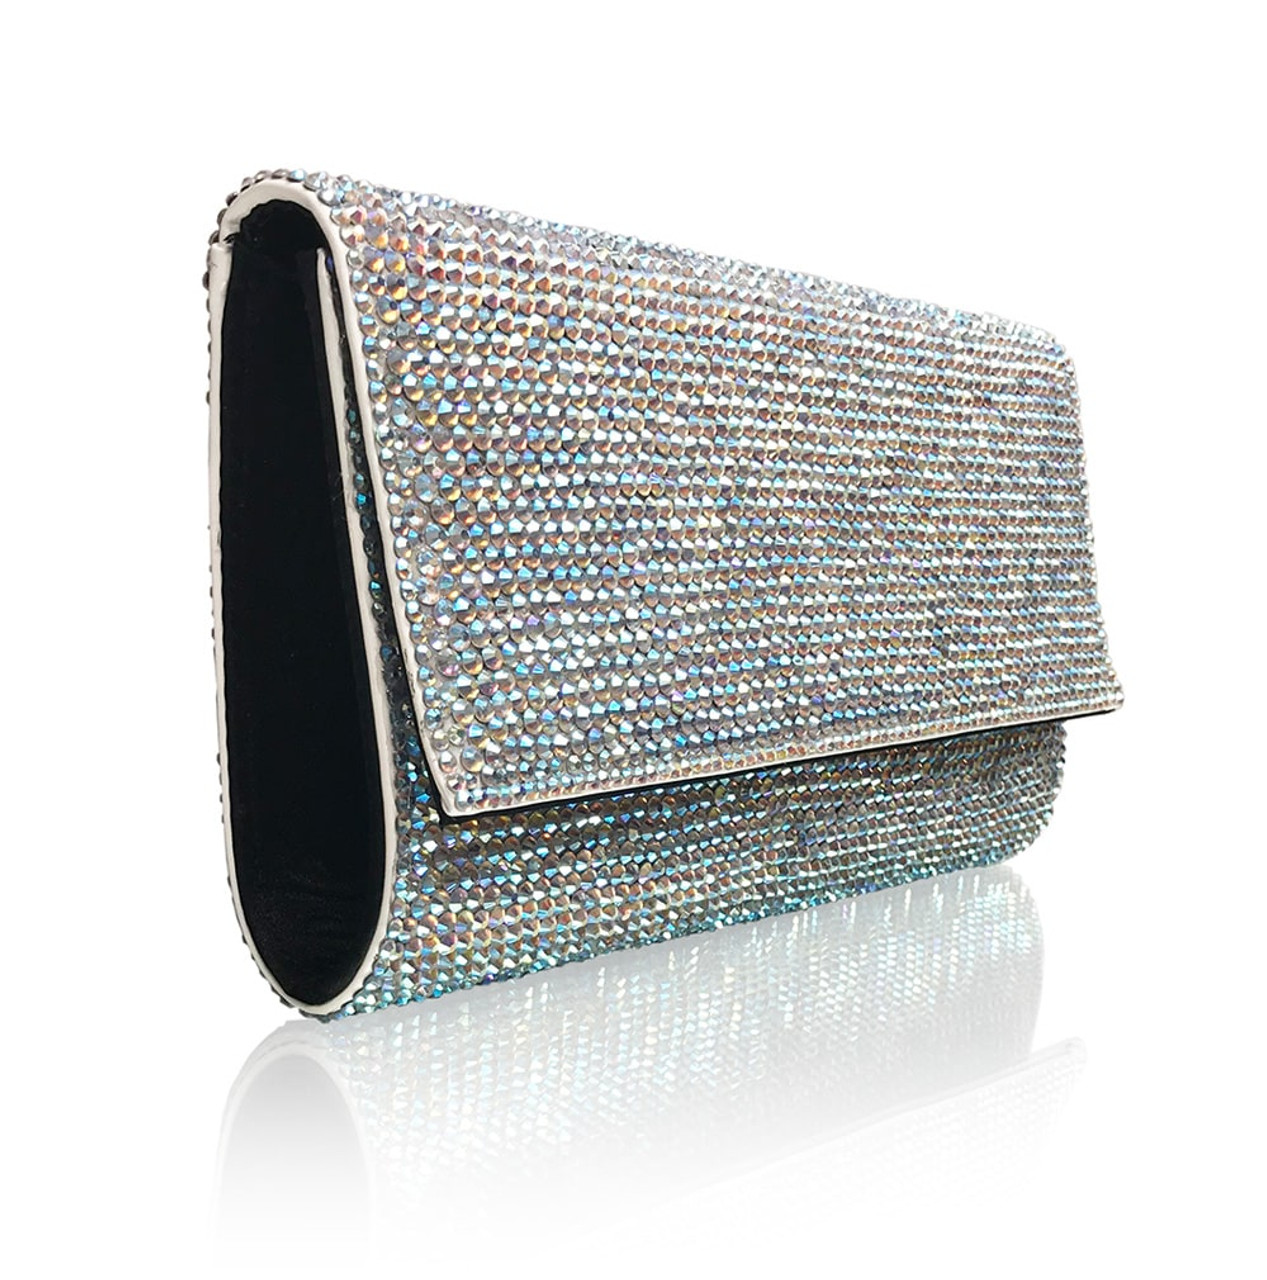 Straight Flap Luxury Evening purse